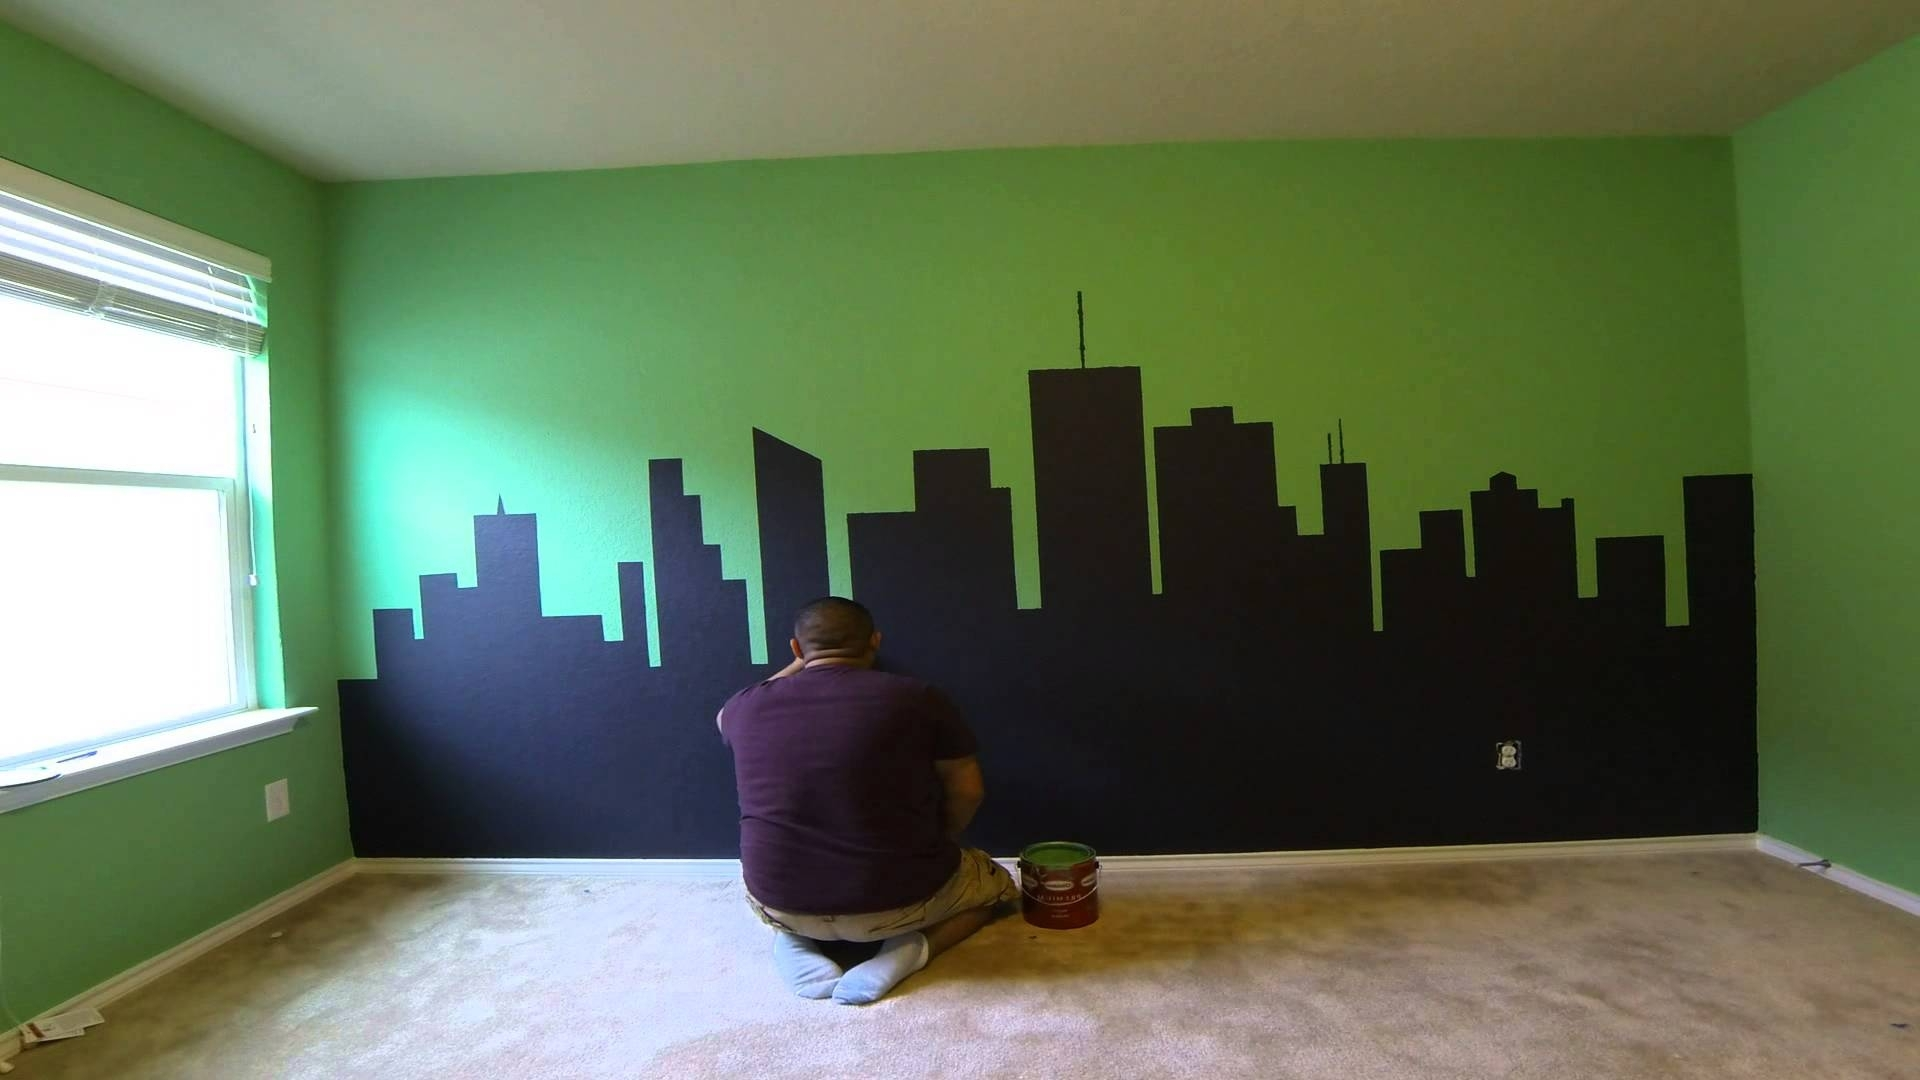 Ninja Turtle Wall Art With Most Up To Date Ninja Turtle Bedroom – Youtube (View 8 of 15)